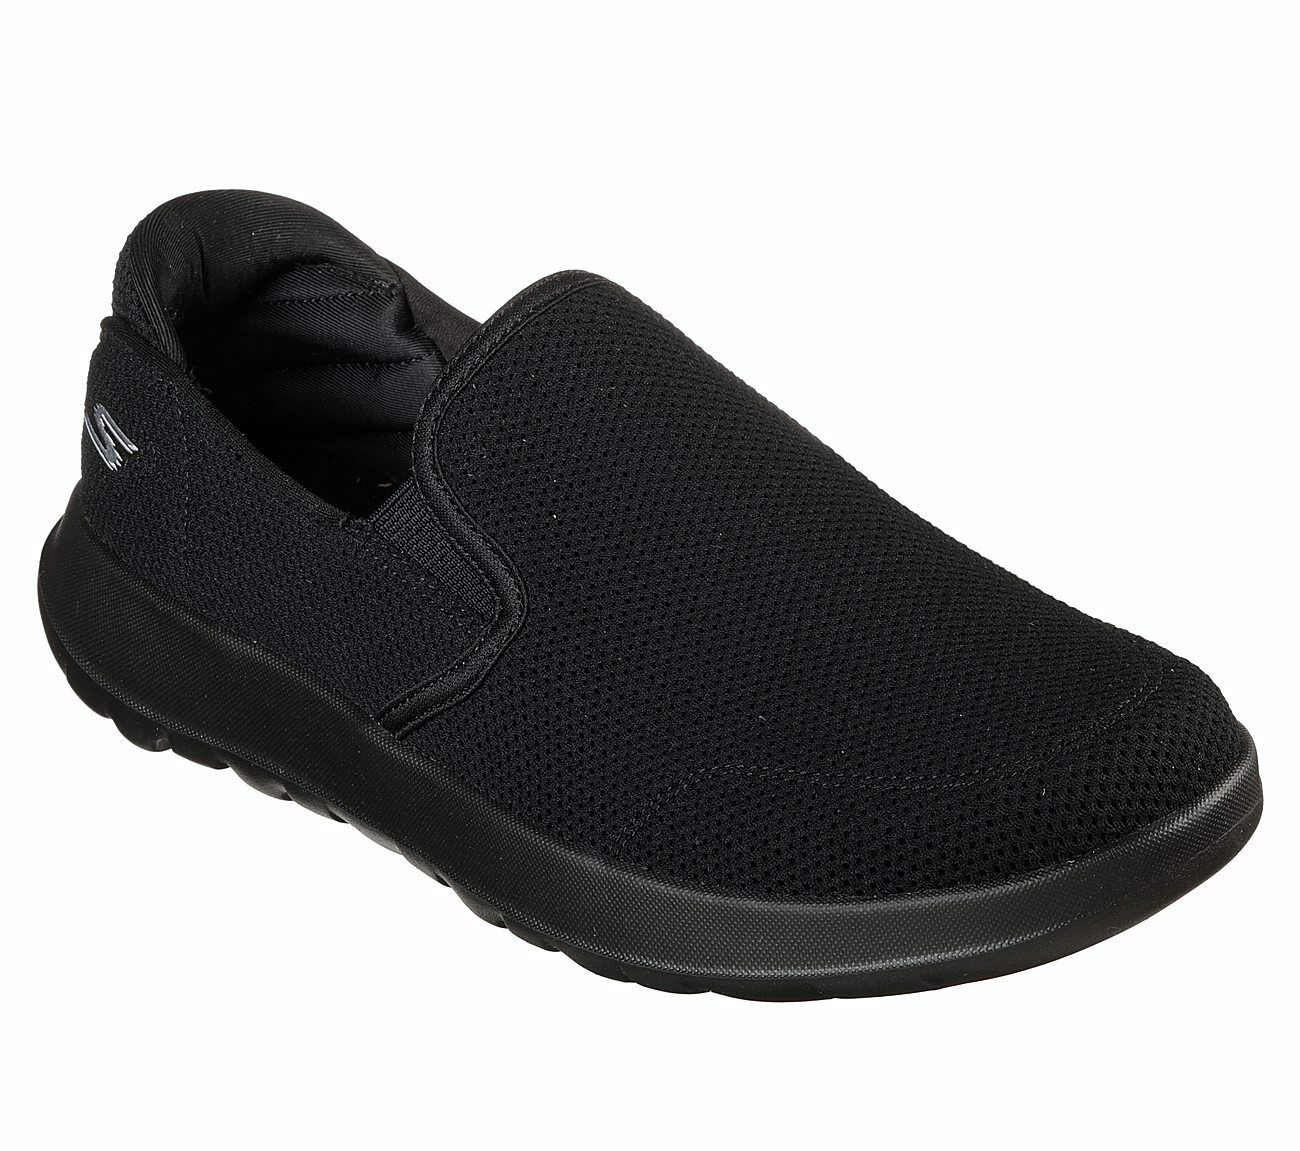 55399 Black Skechers shoes On The Go Walk Men Sporty Casual Comfort Slip on Mesh